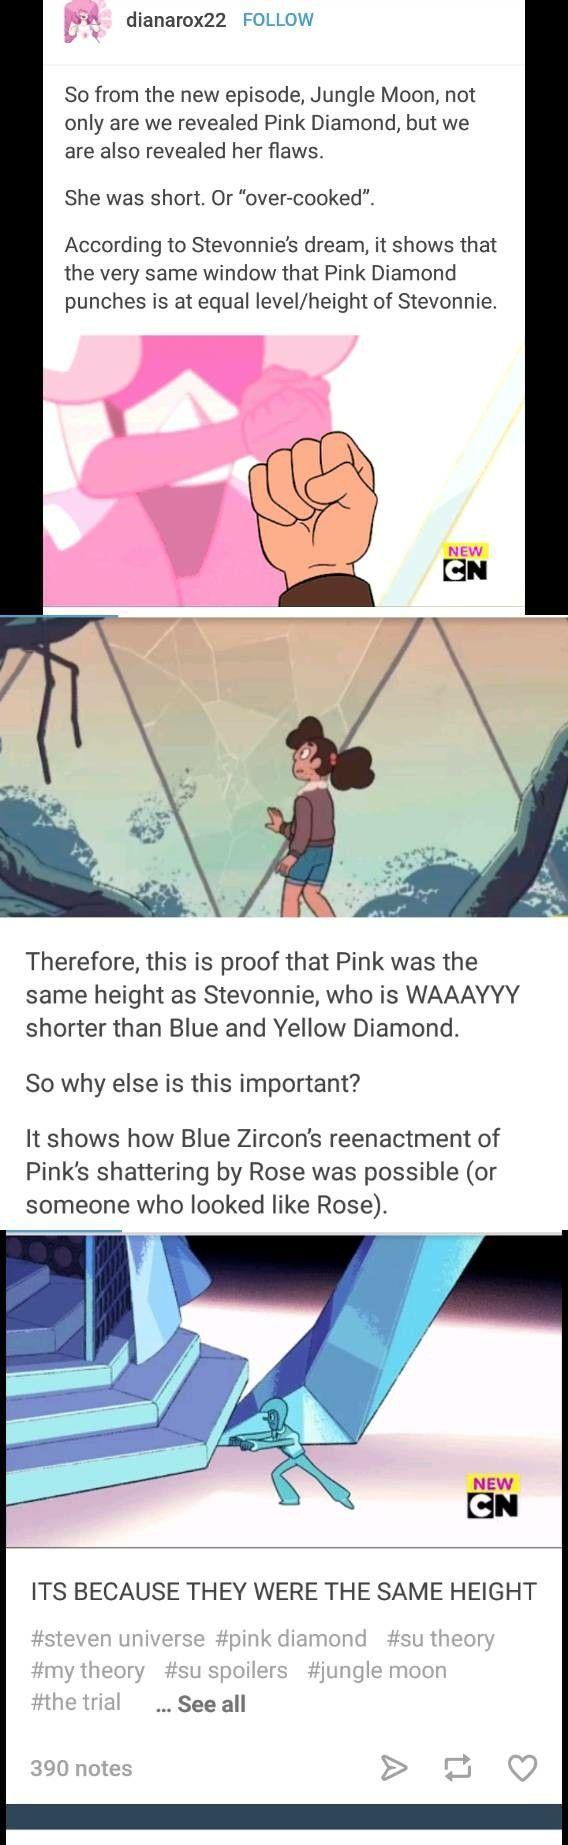 pink diamond theory fandoms